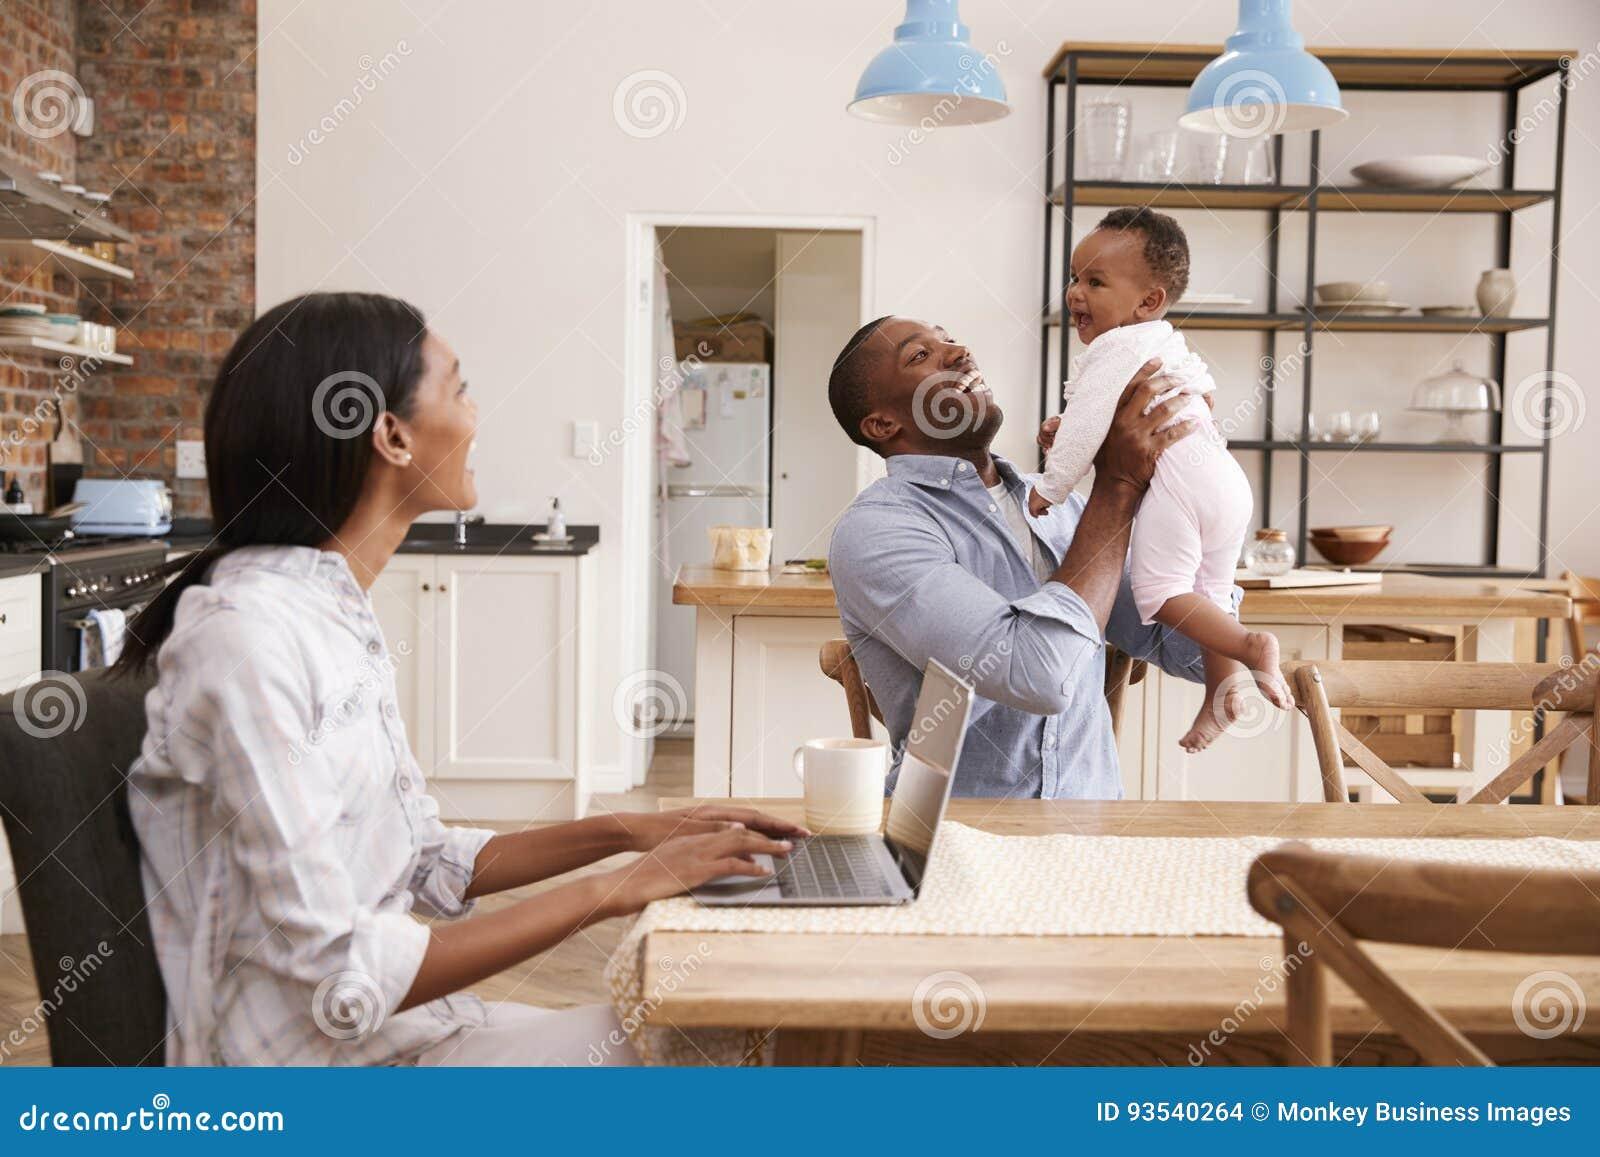 La madre trabaja de hogar como padre Holds Baby Daughter